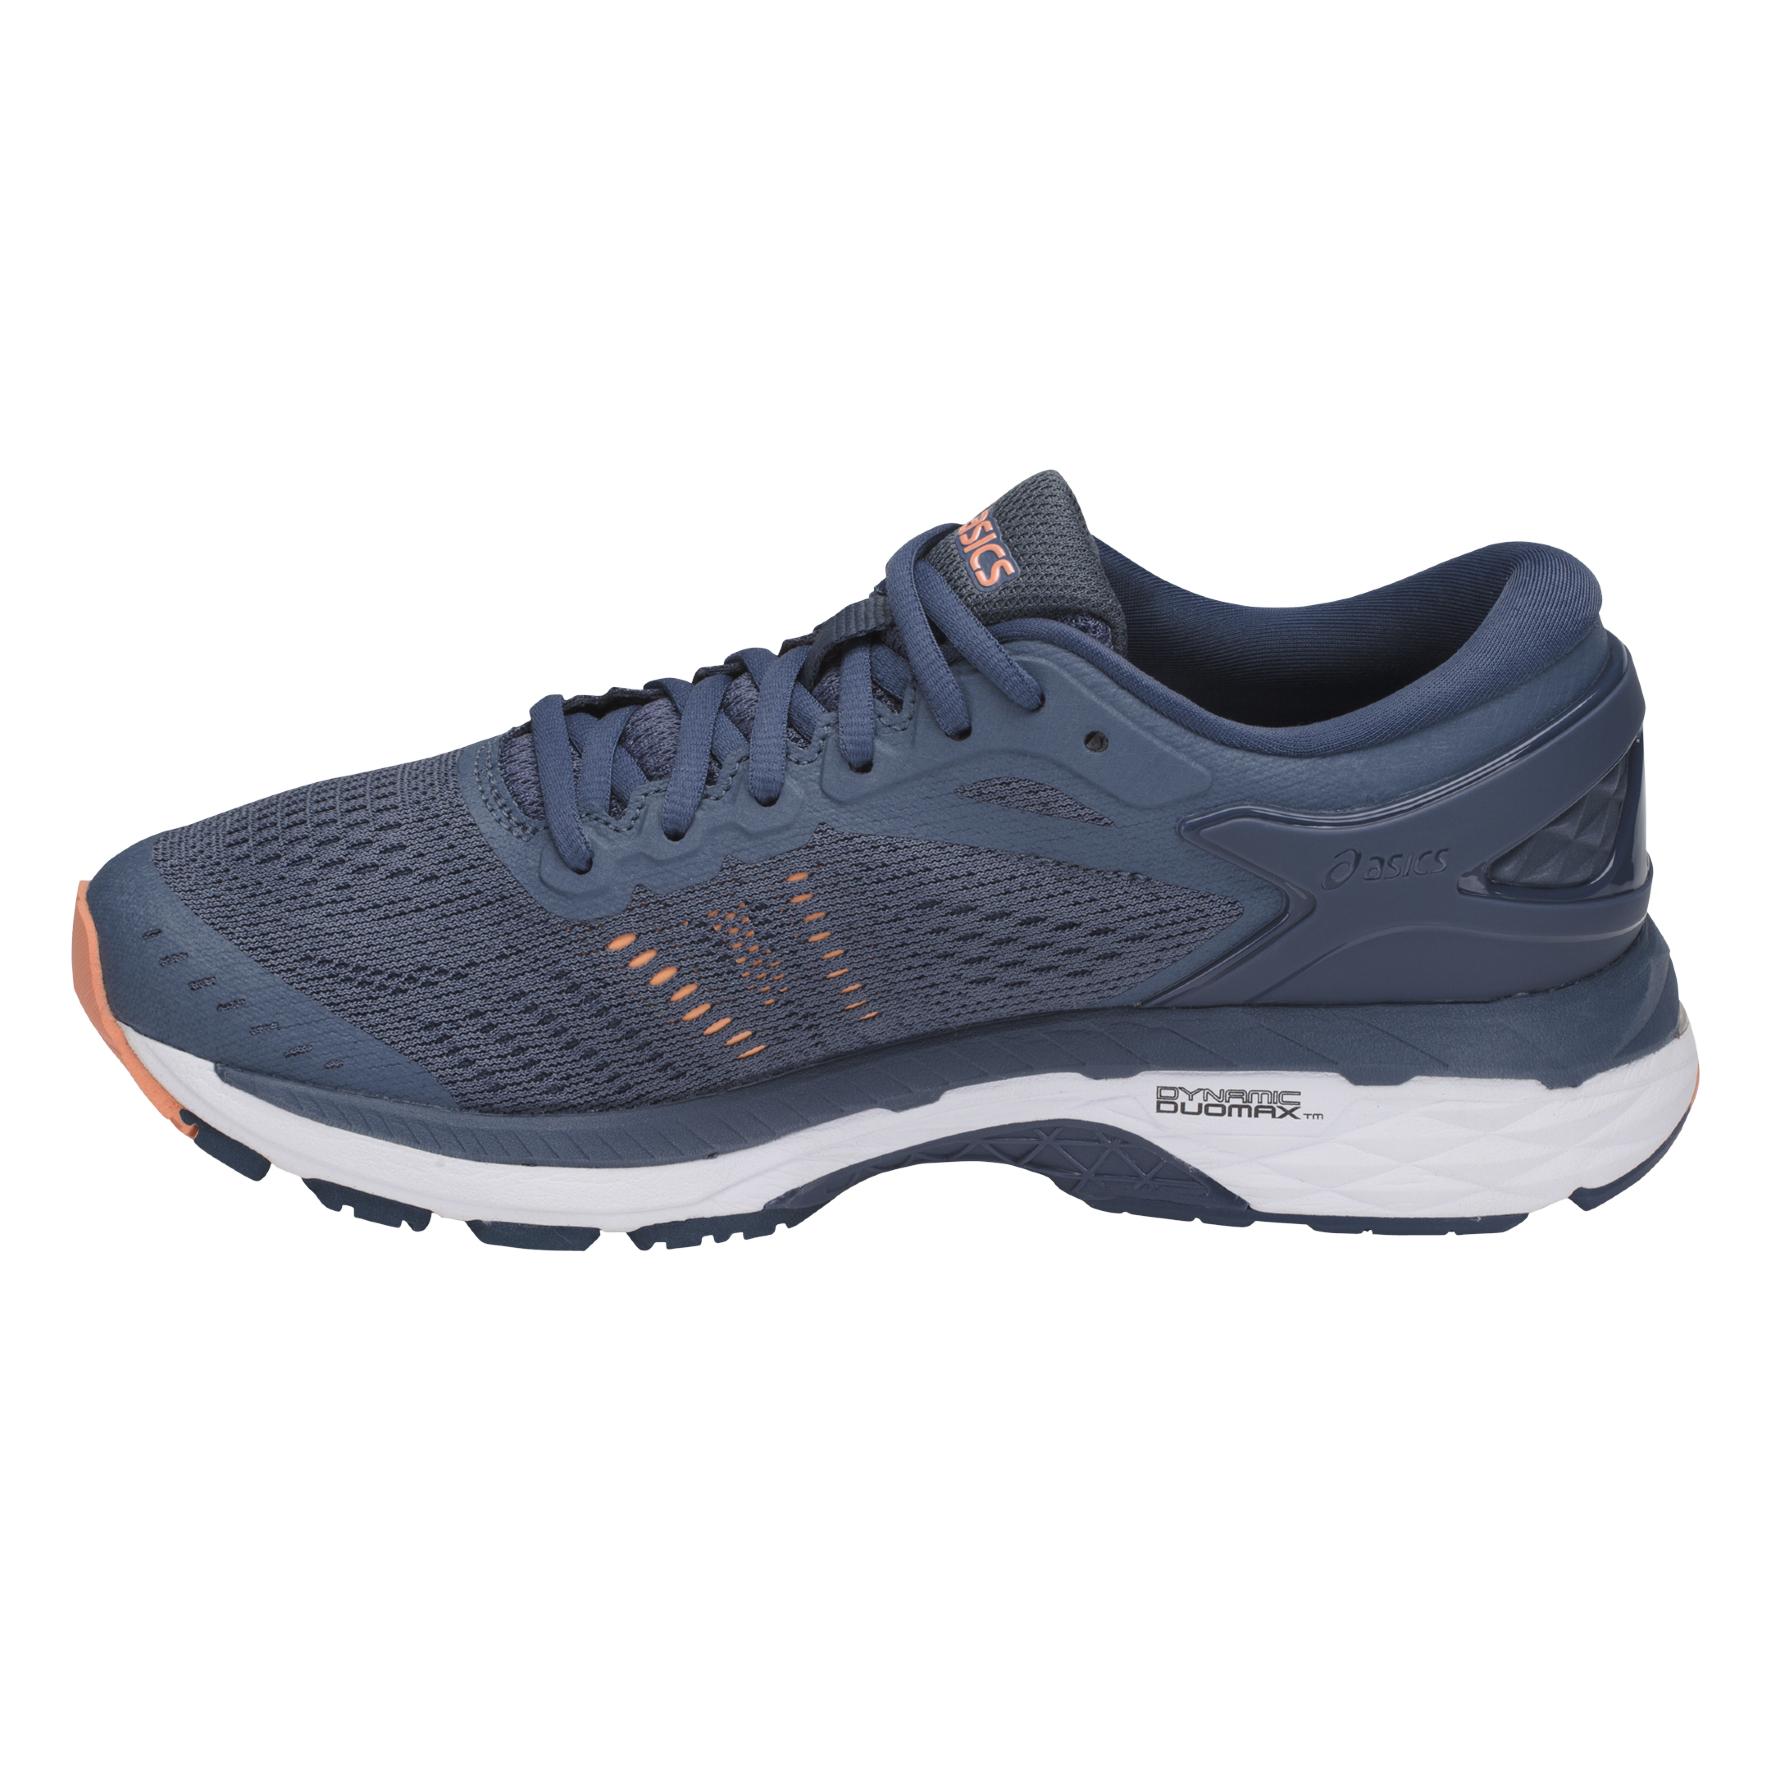 Asics Gel-Kayano 24 - Damen Laufschuhe Running Schuhe - T799N-5649 ...